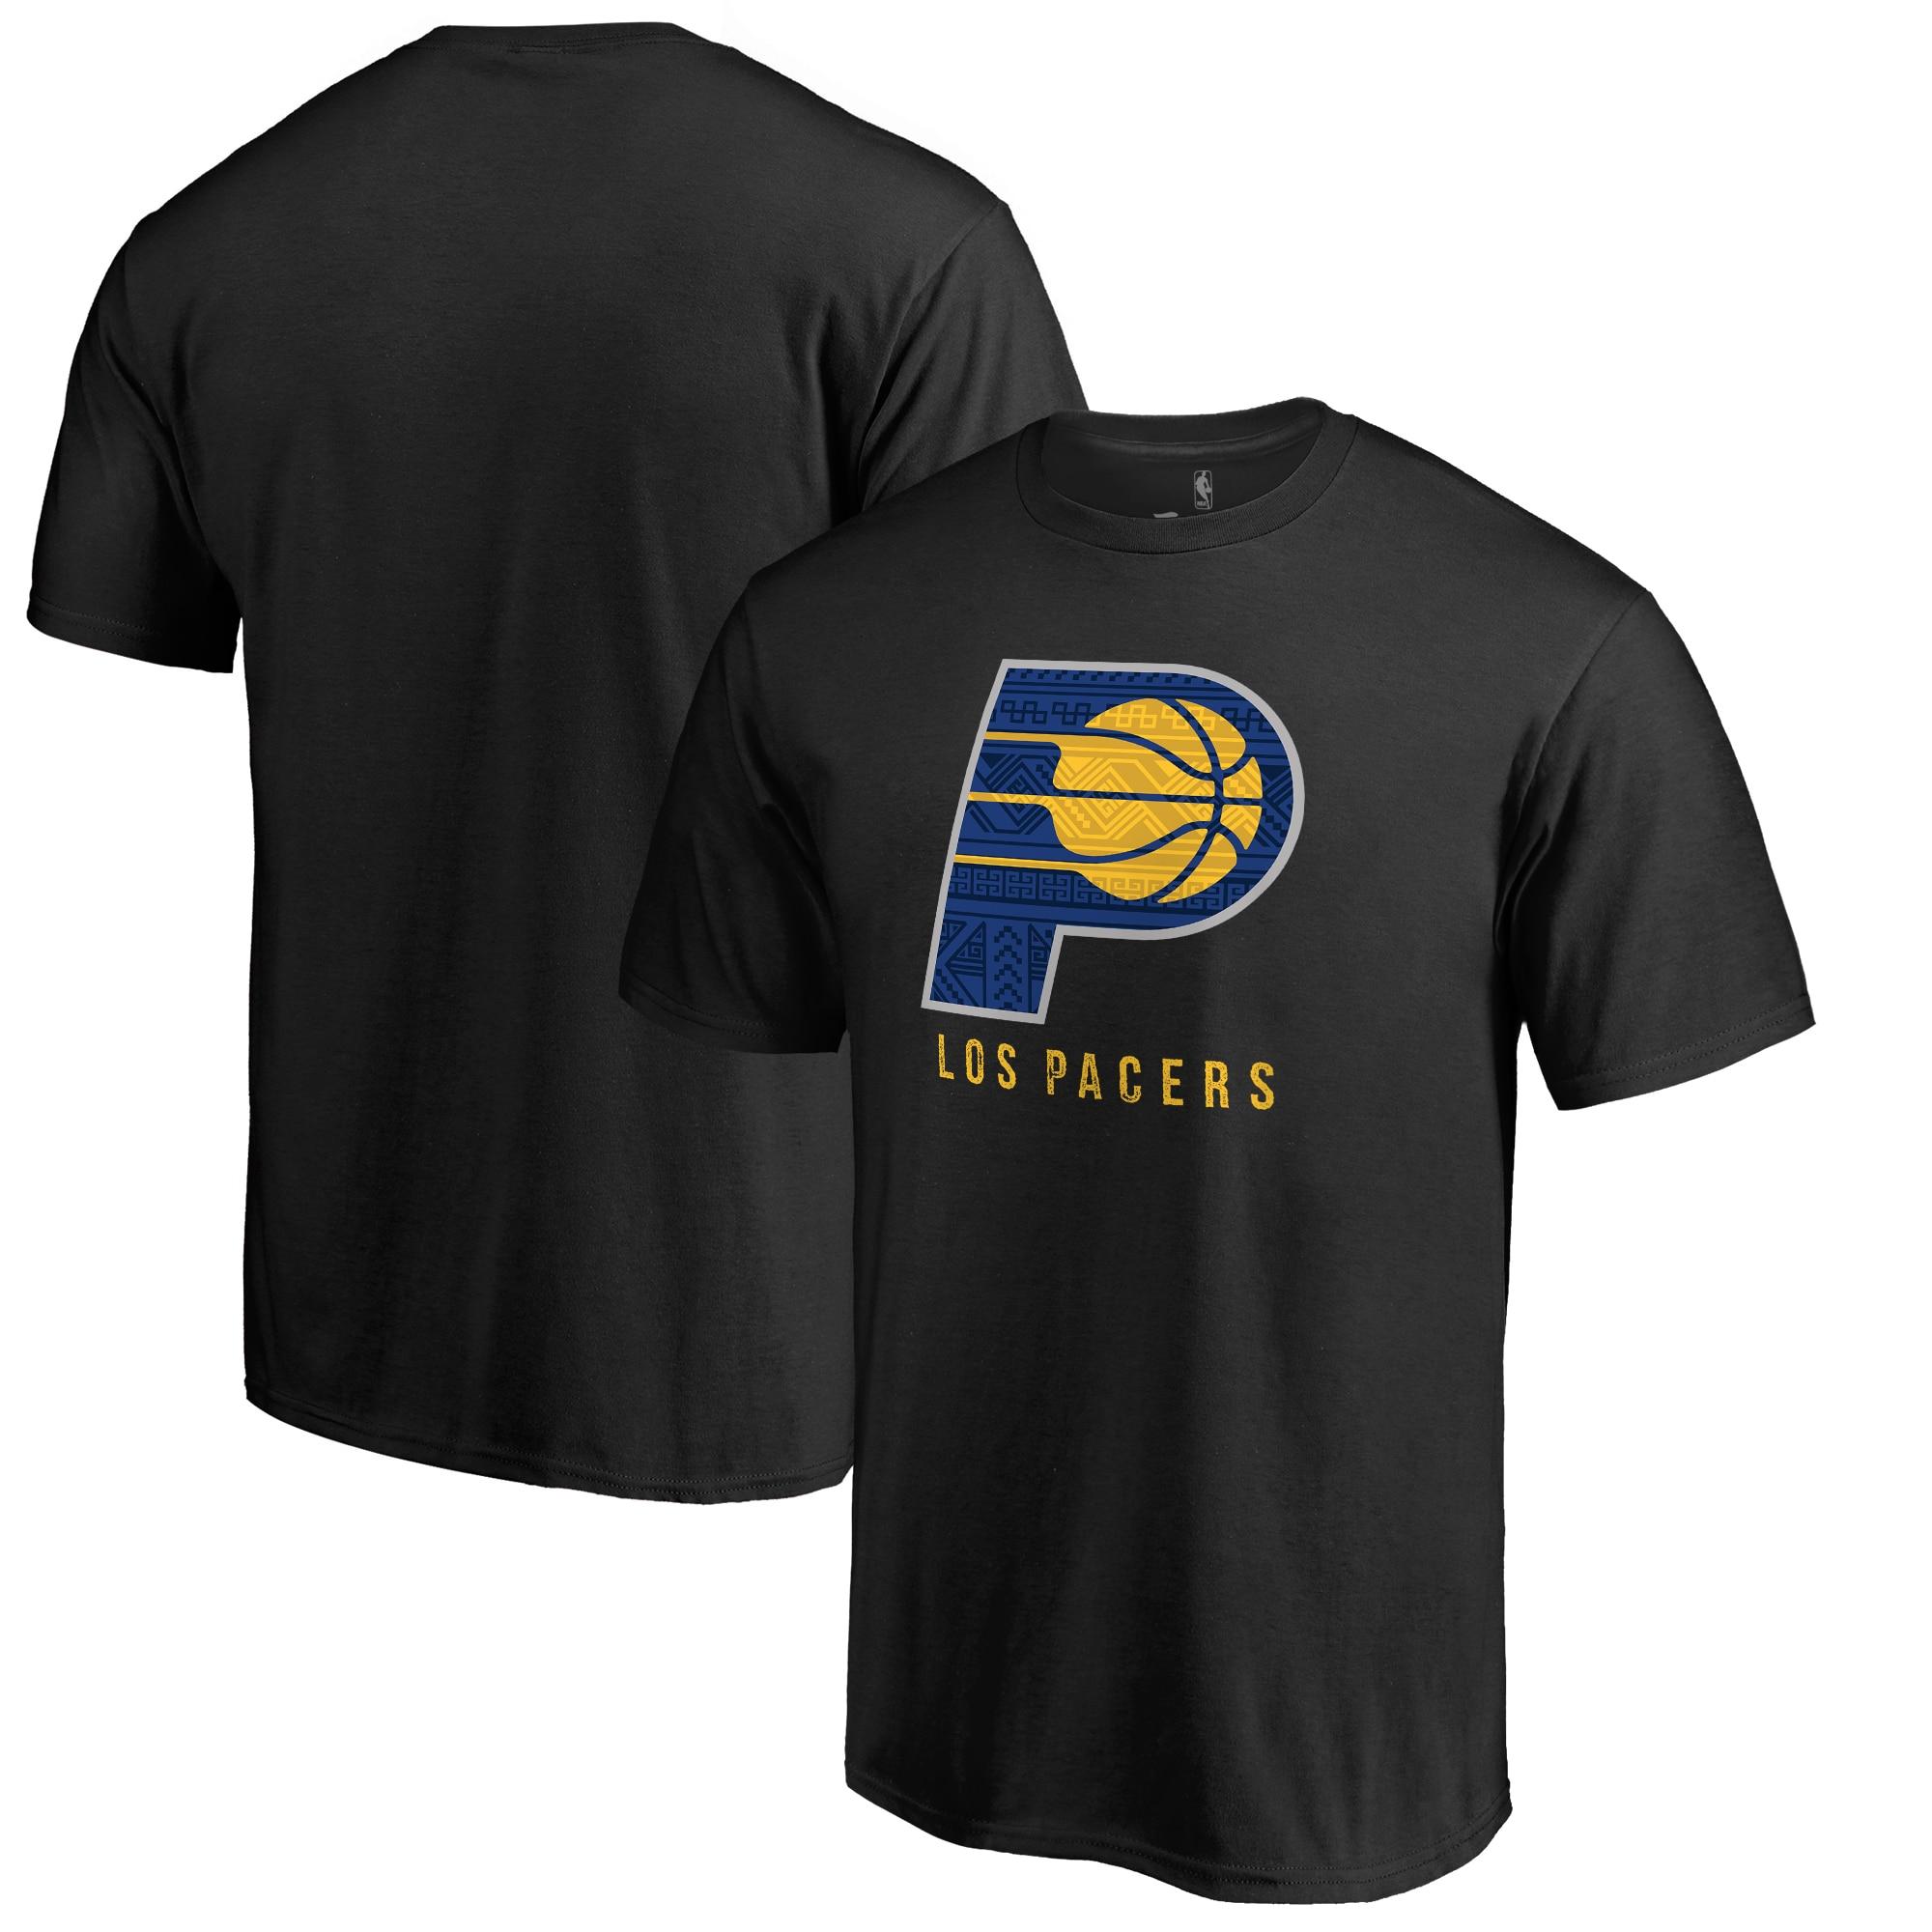 Indiana Pacers Fanatics Branded 2017 Noches Éne-Bé-A T-Shirt - Black